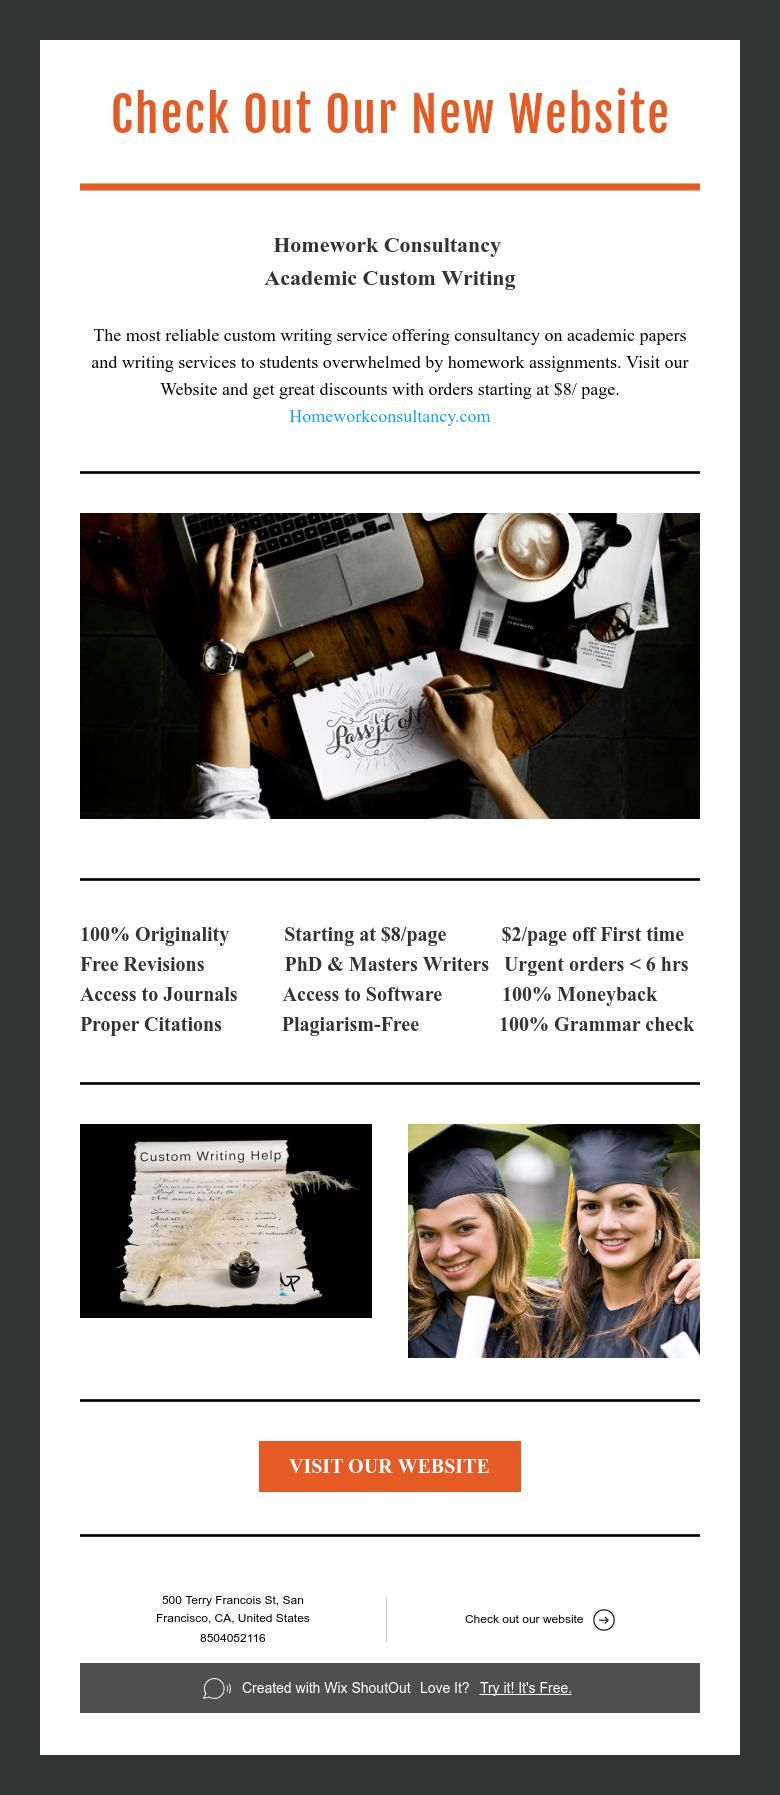 custom home work writers websites for masters